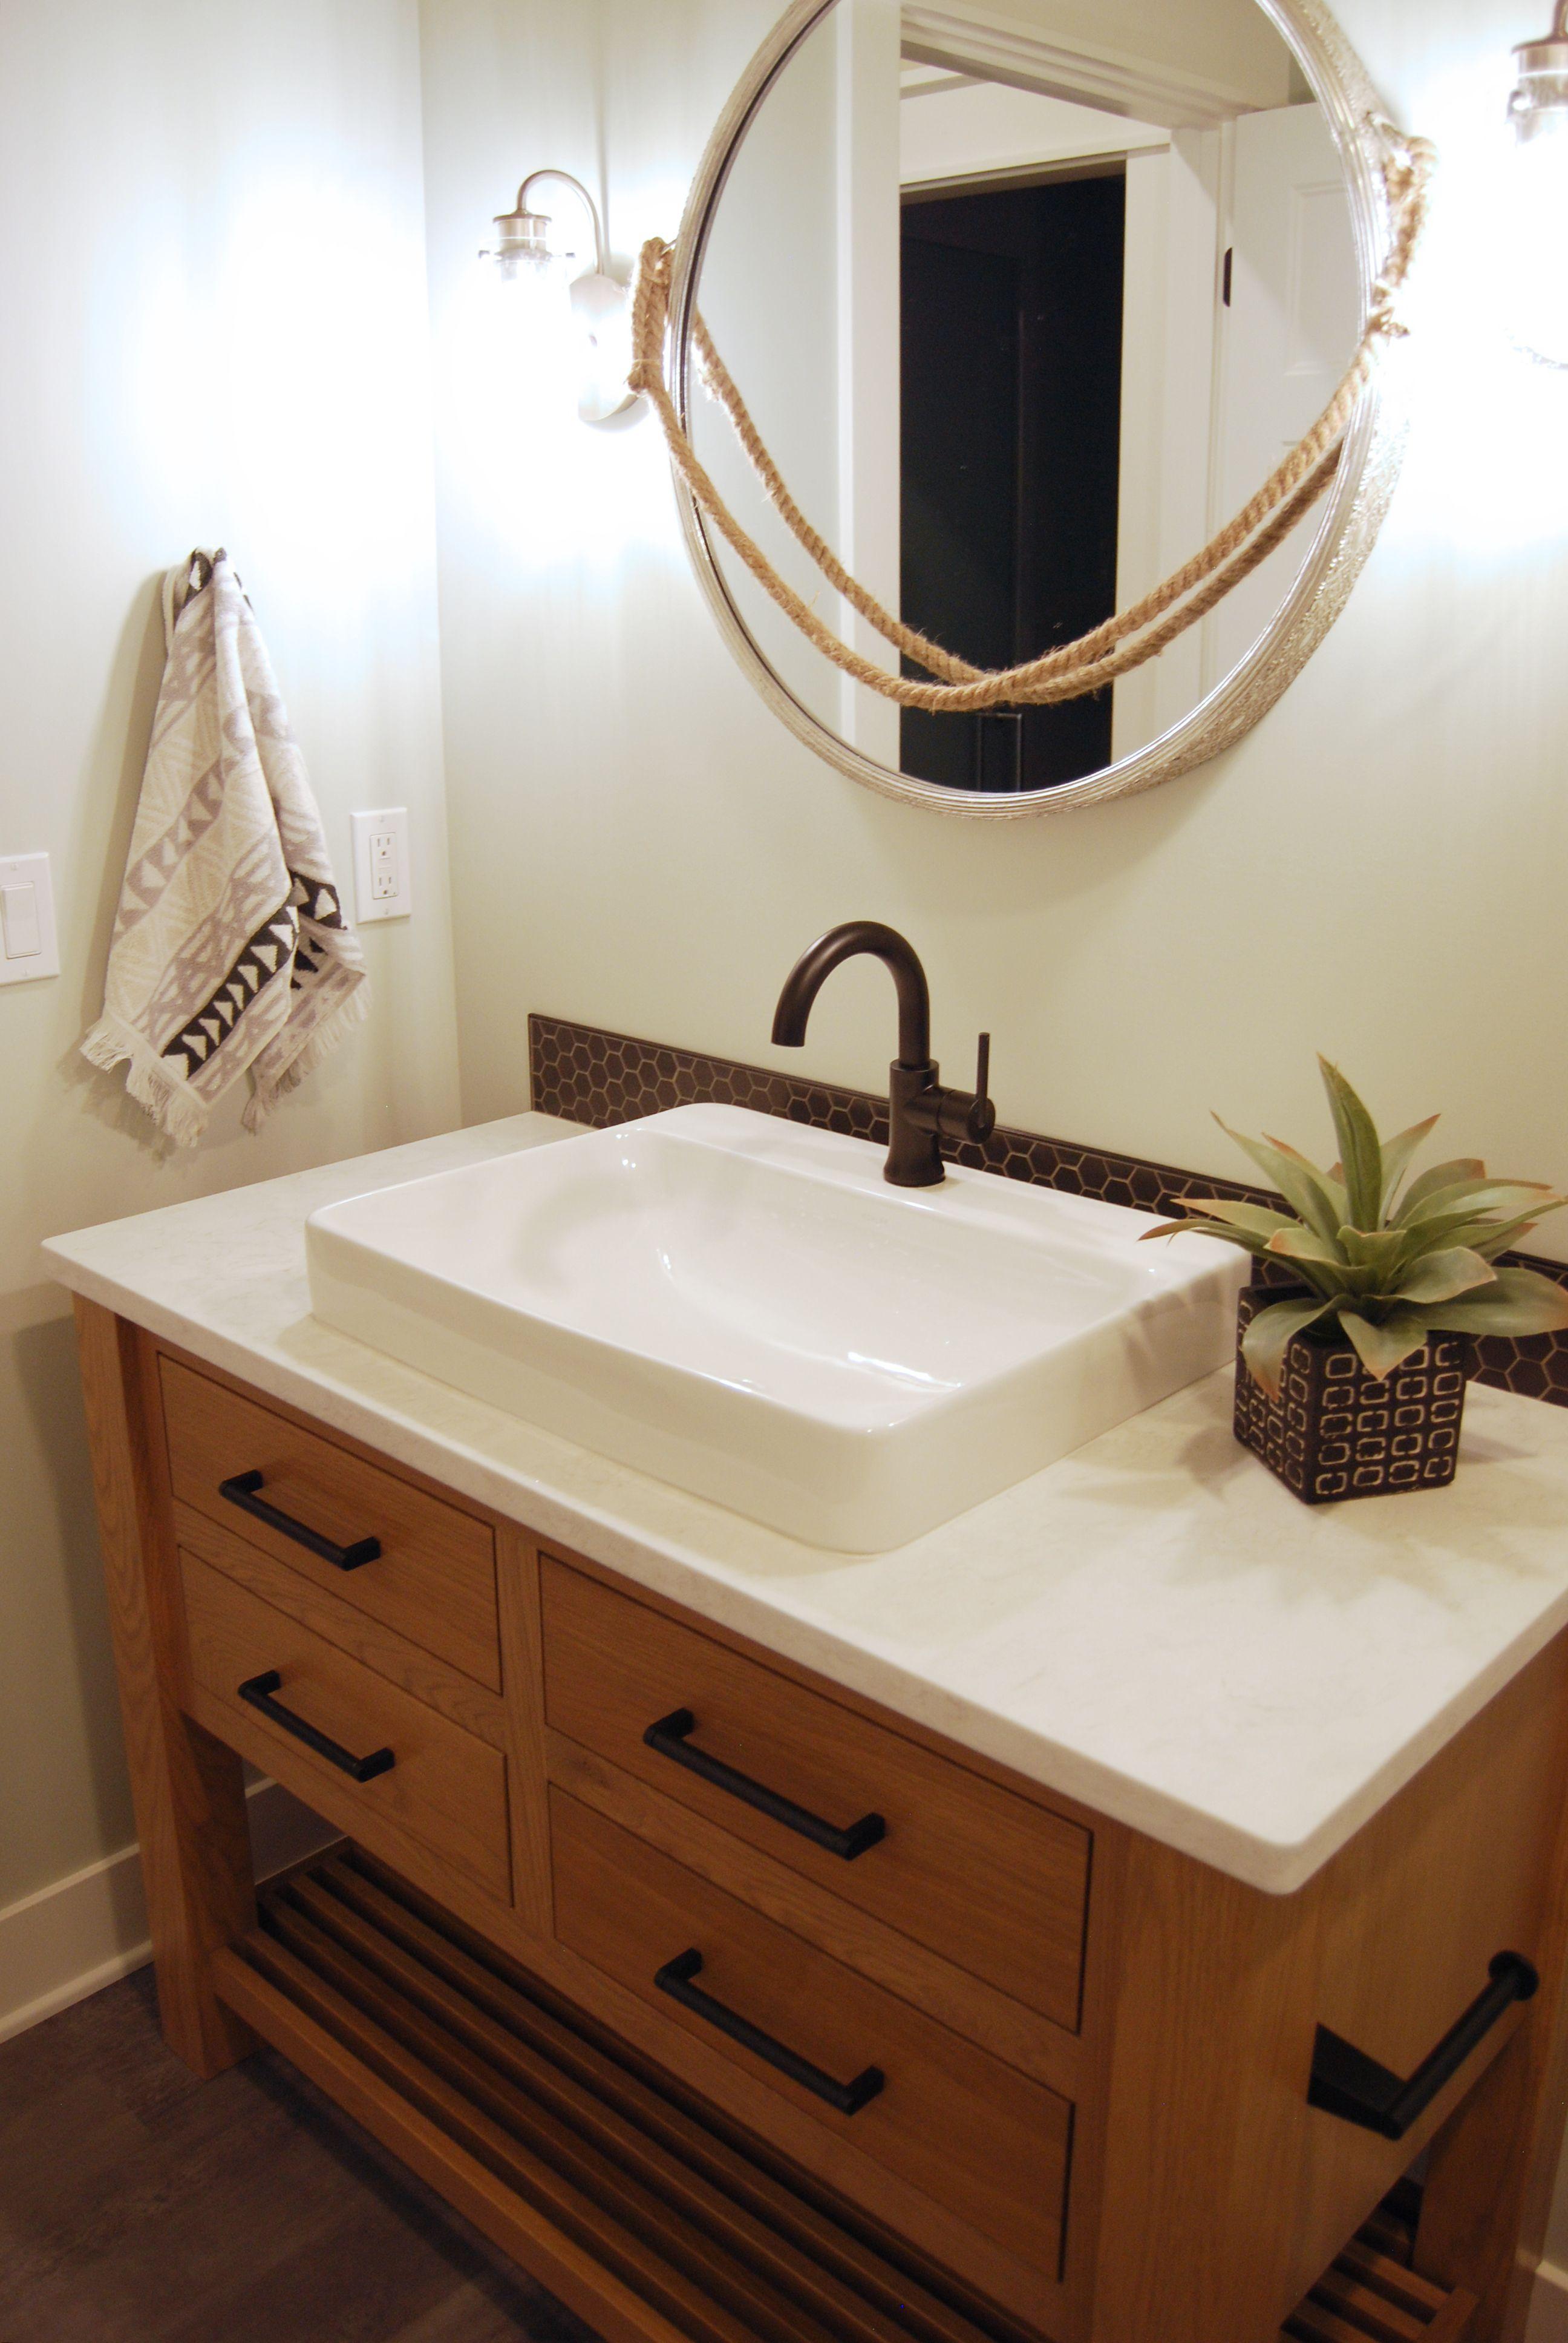 MSI Q Quartz Marbella White | PGS Baths | Pinterest | Bathroom ...